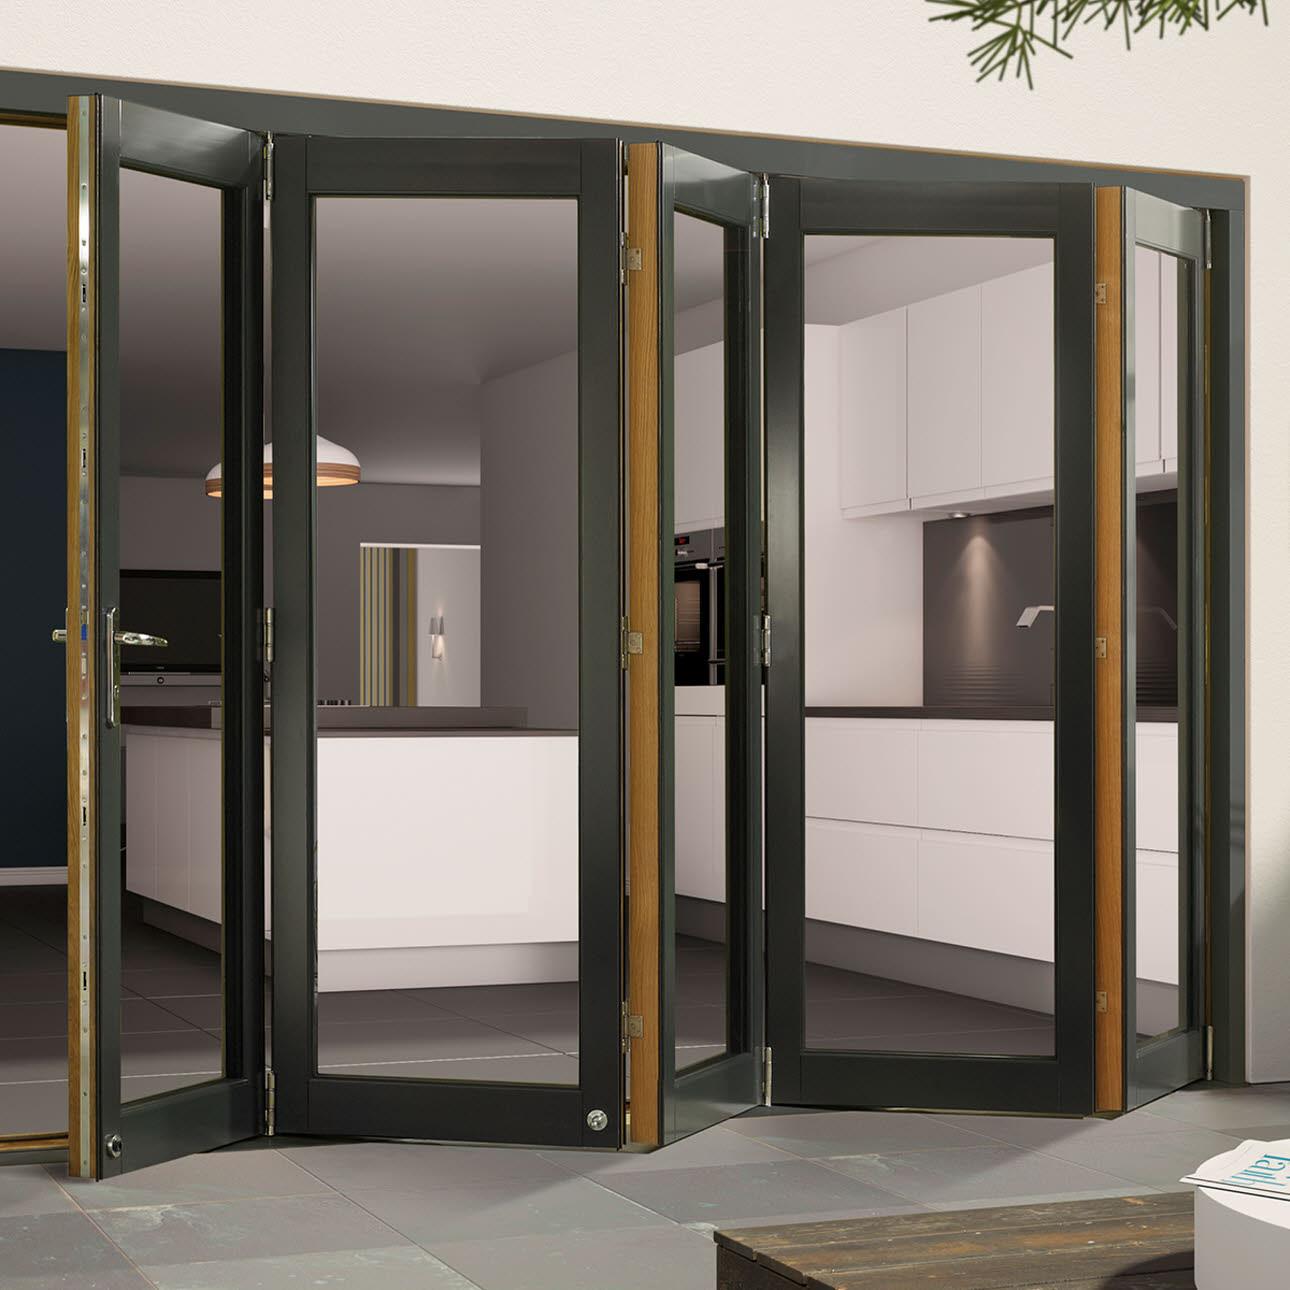 Best ideas about Folding Patio Doors . Save or Pin Bifolding Doors Doors Now.